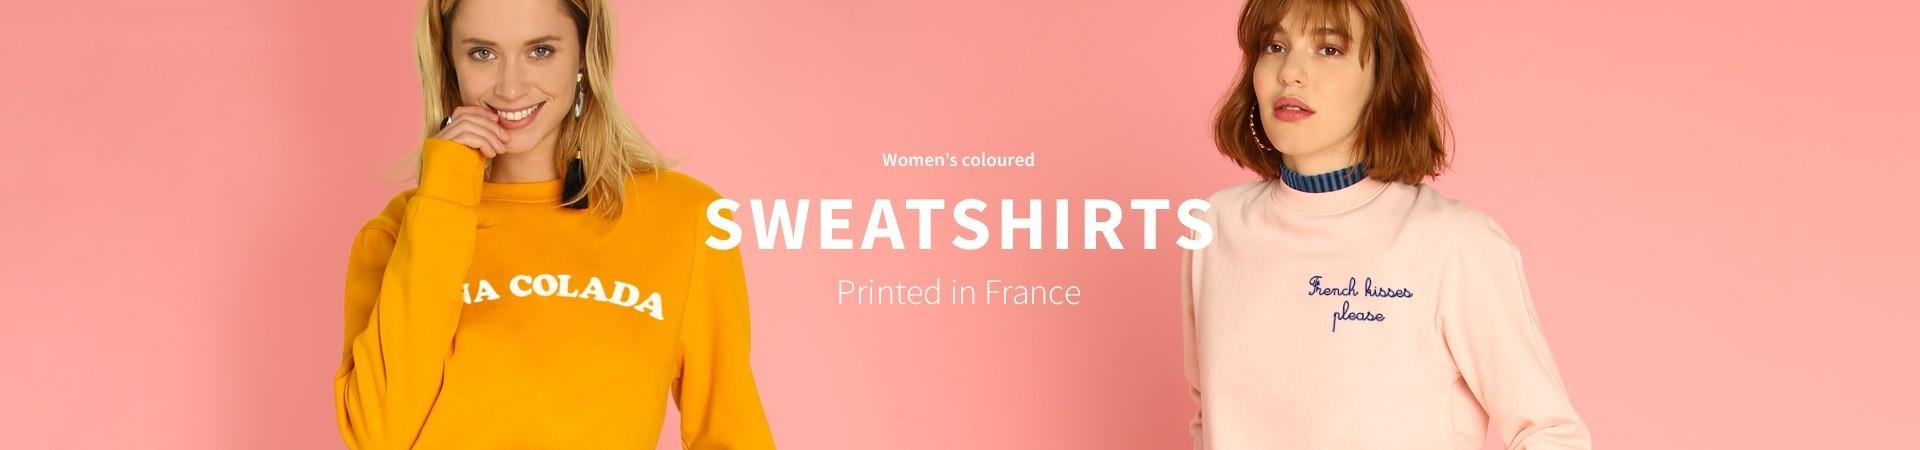 Coloured Sweatshirts